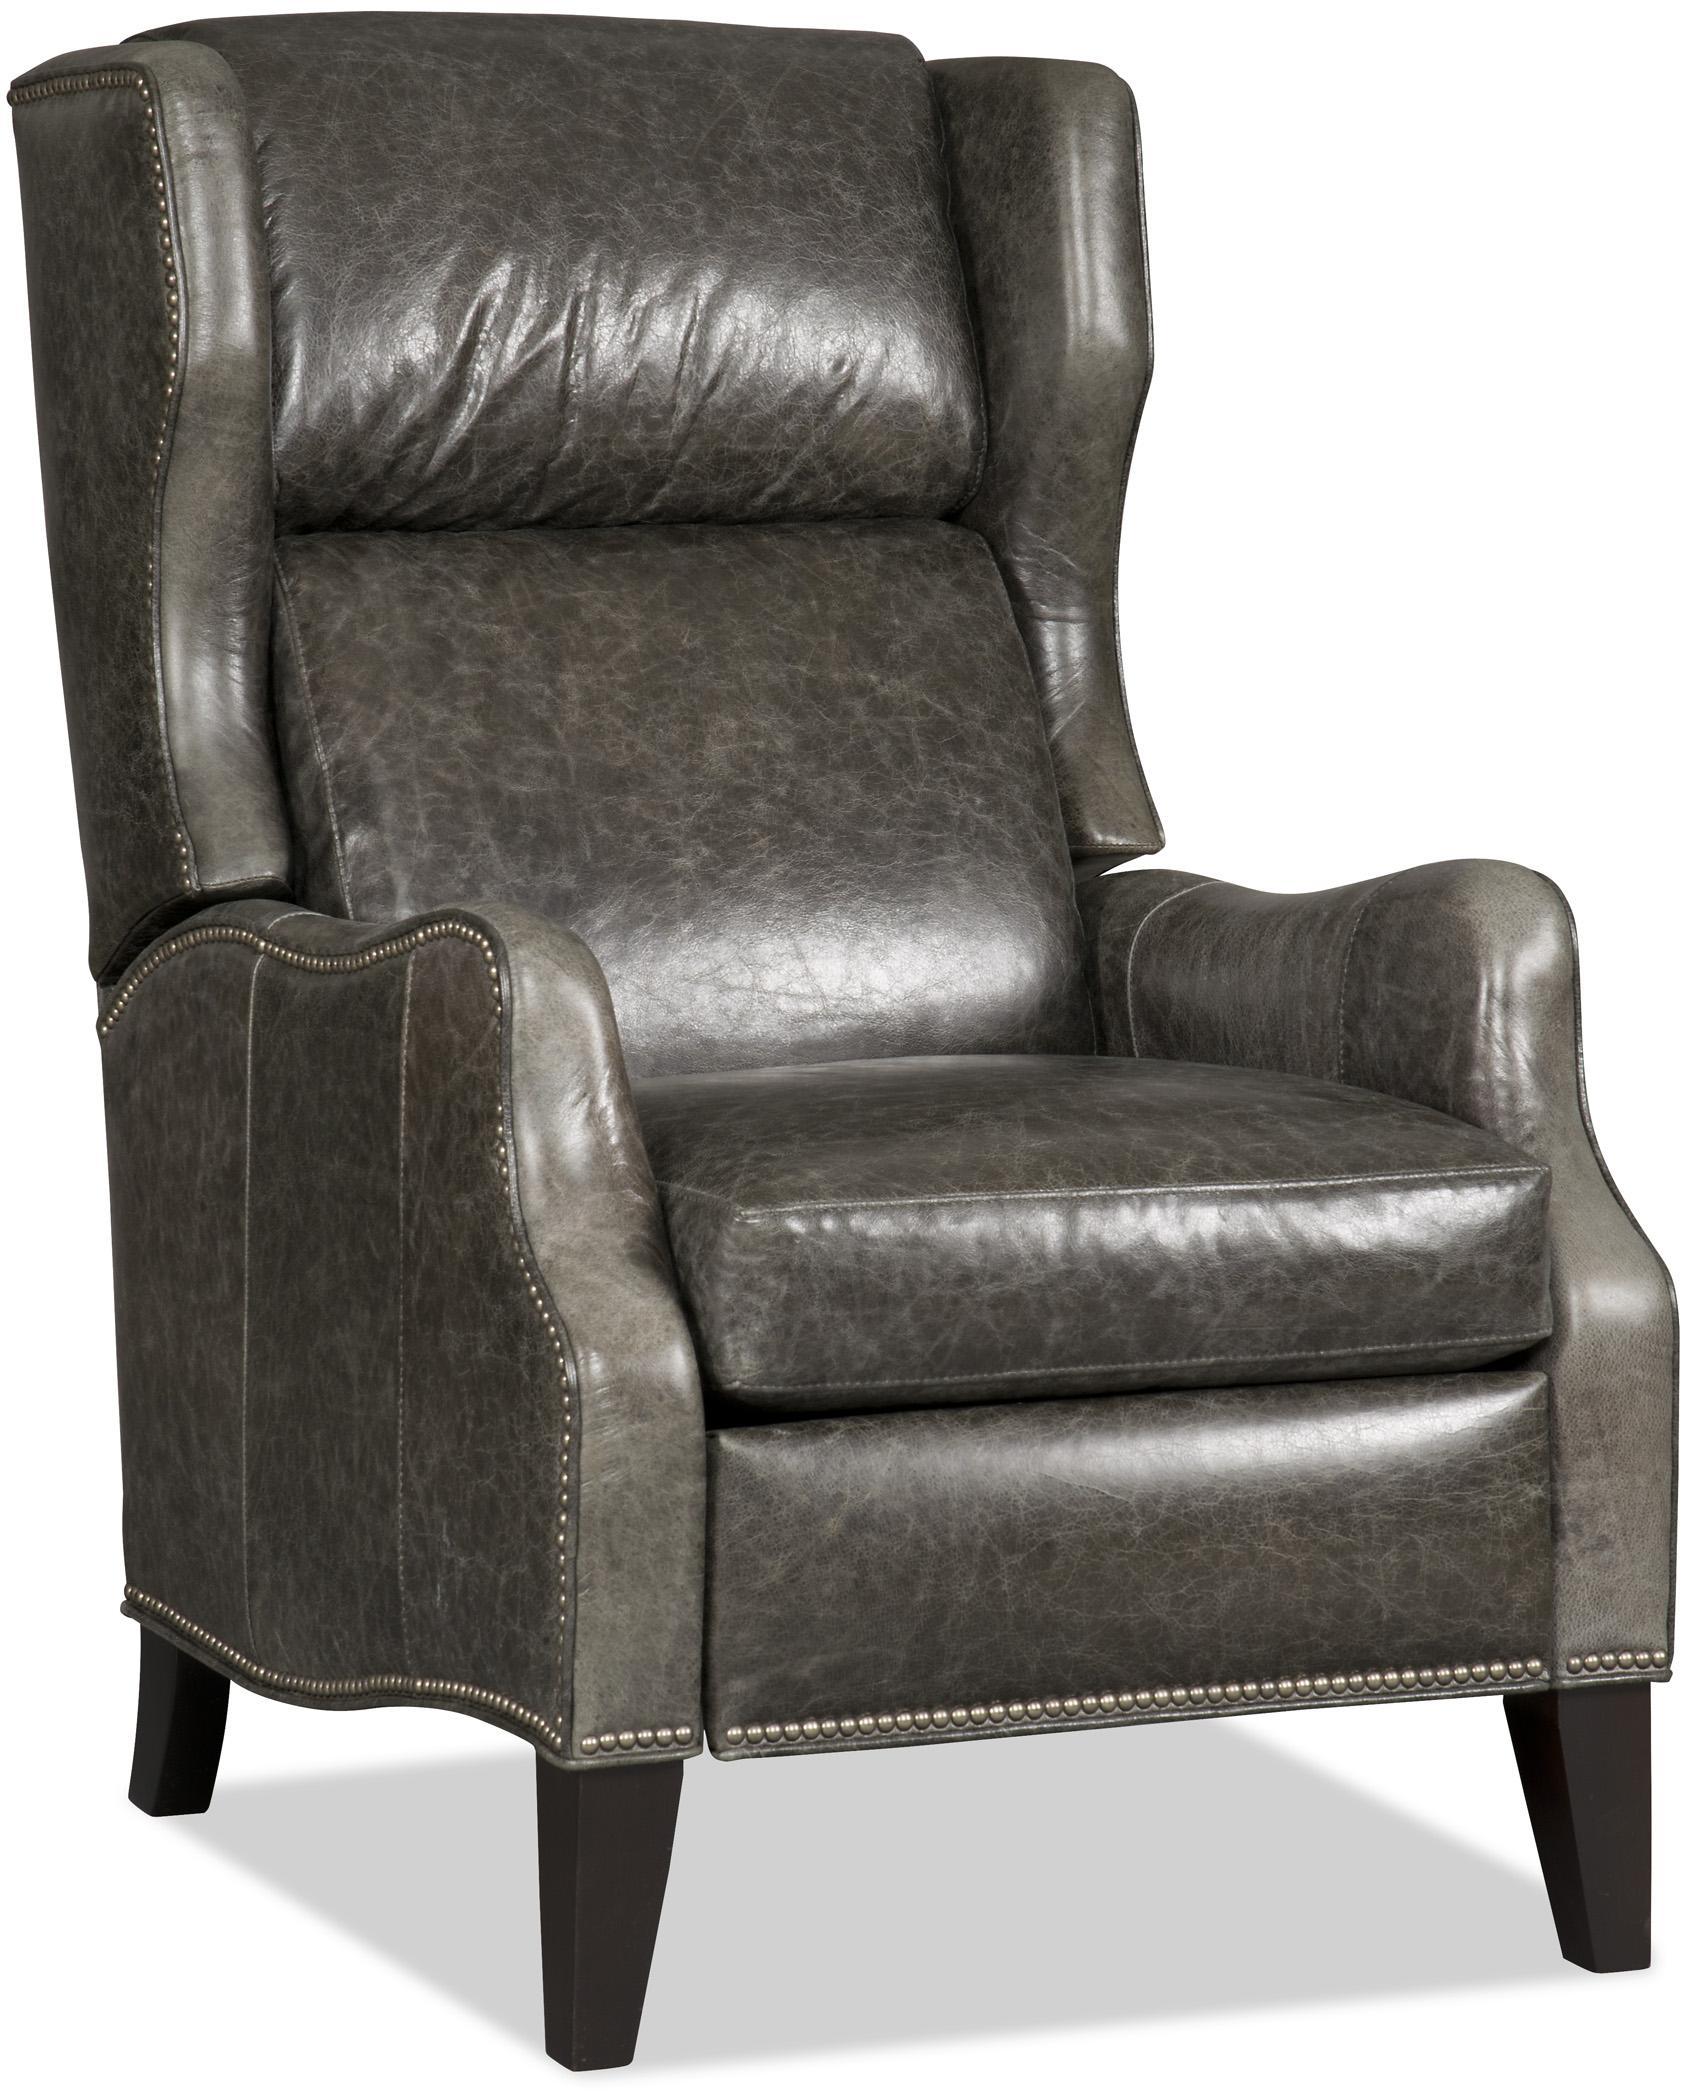 Bradington Young Chairs That Recline Vesta Three Way Lounger Mueller Furniture High Leg